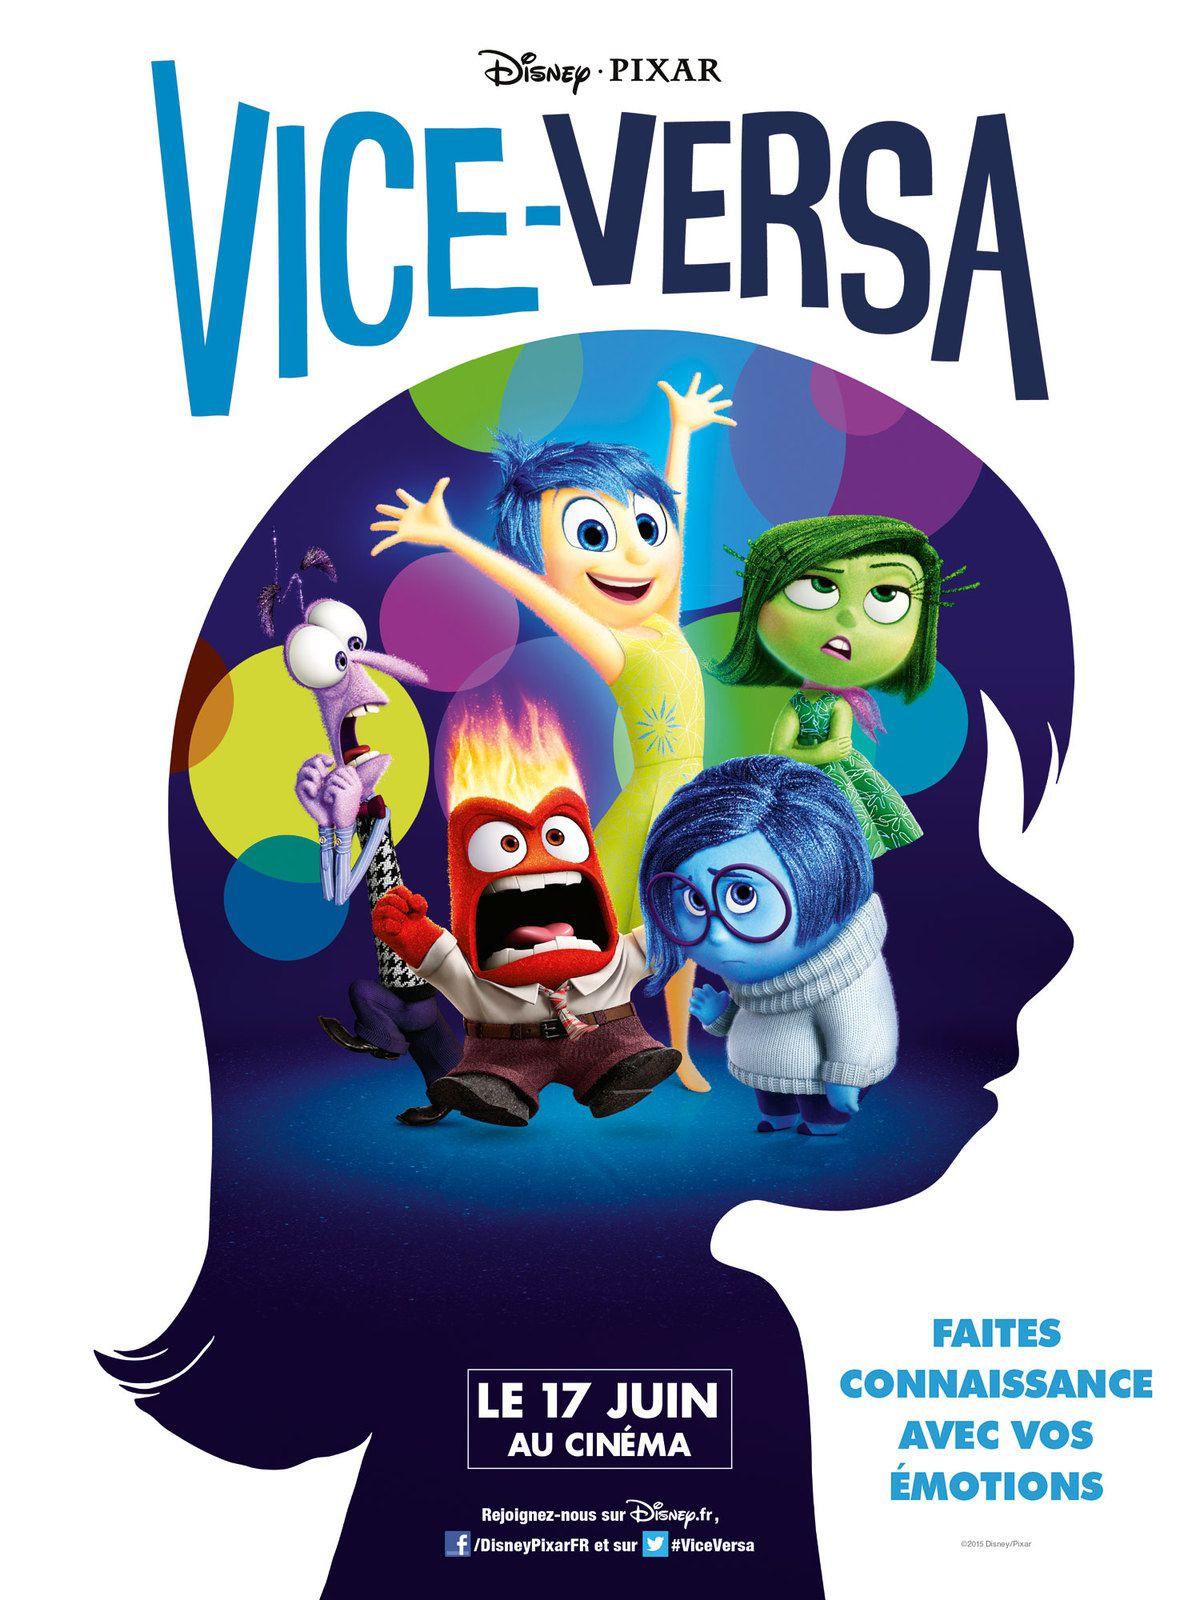 VICE-VERSA - la critique